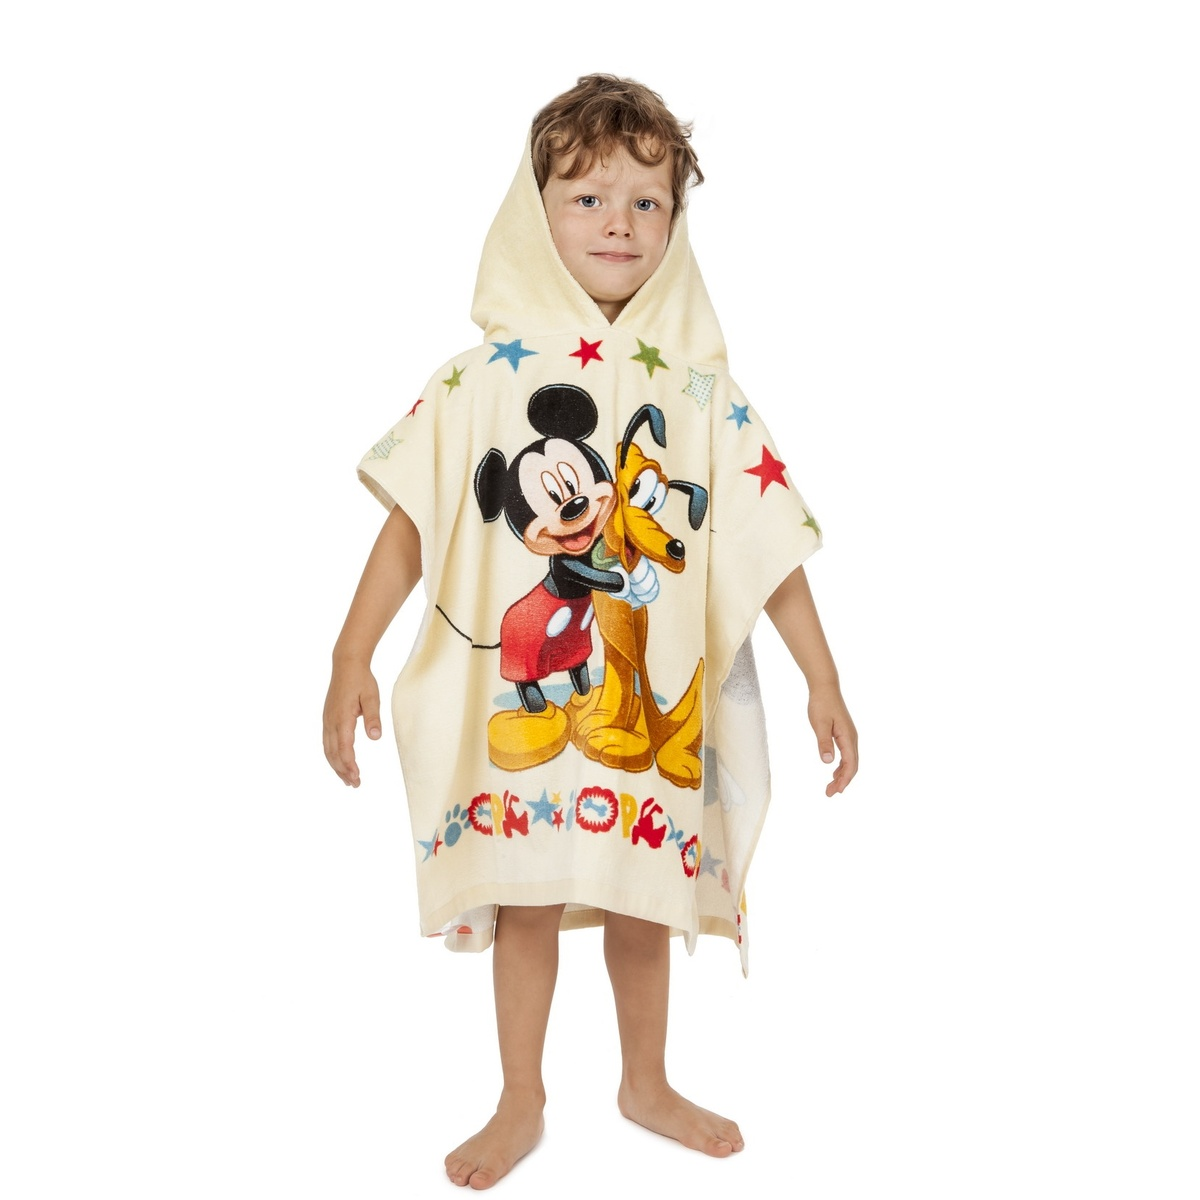 Plážová osuška Jerry Fabrics pončo Mickey Mouse froté 60x120 cm